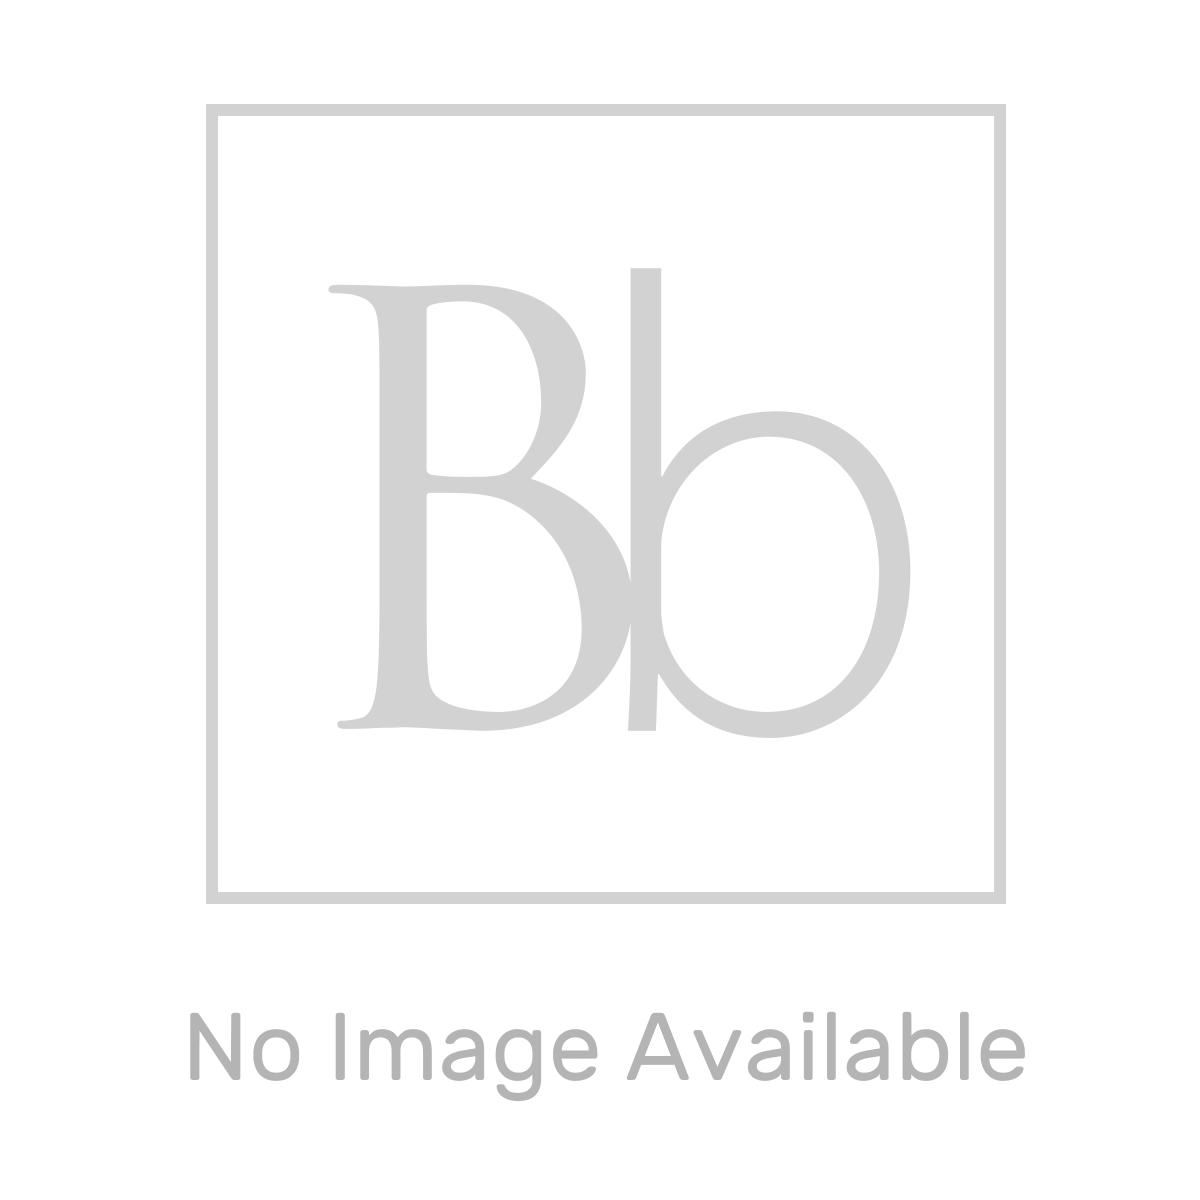 RAK Surface Night Tile 600 x 600mm